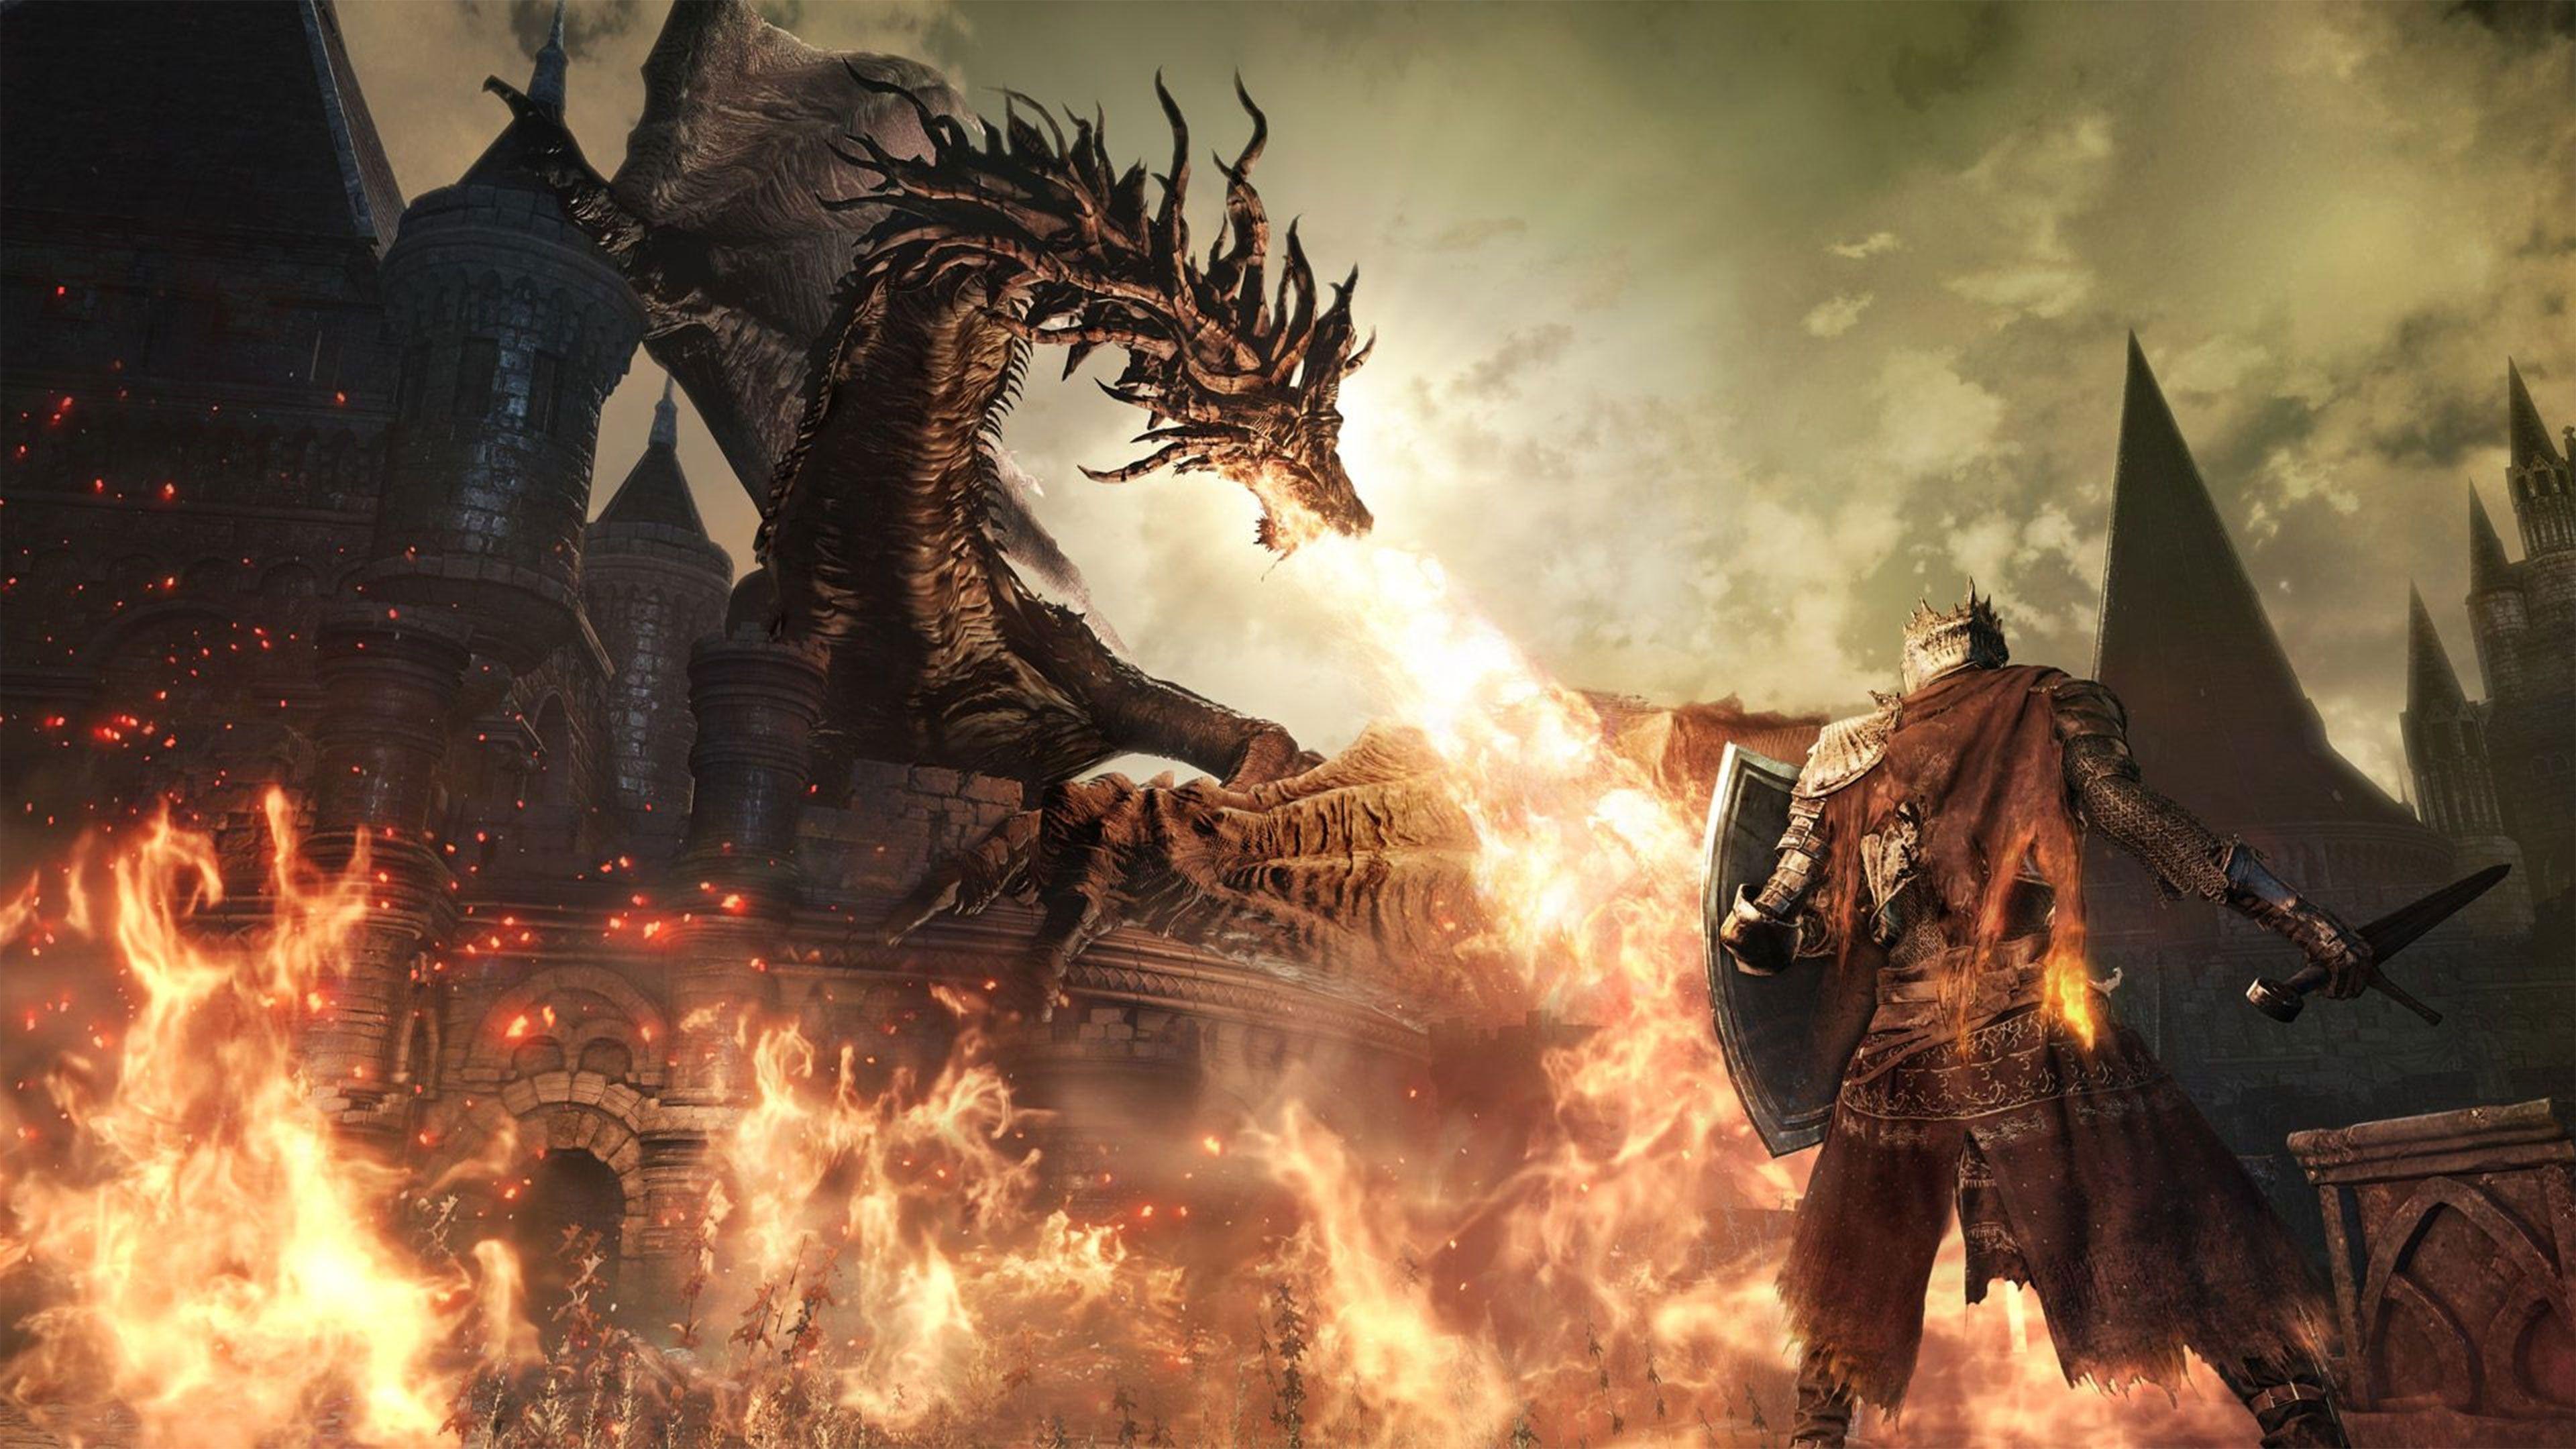 Dark Souls 3 Abyss Watchers Wallpaper 2021 Live Wallpaper Hd Dark Souls Game Dark Souls Dark Souls 3